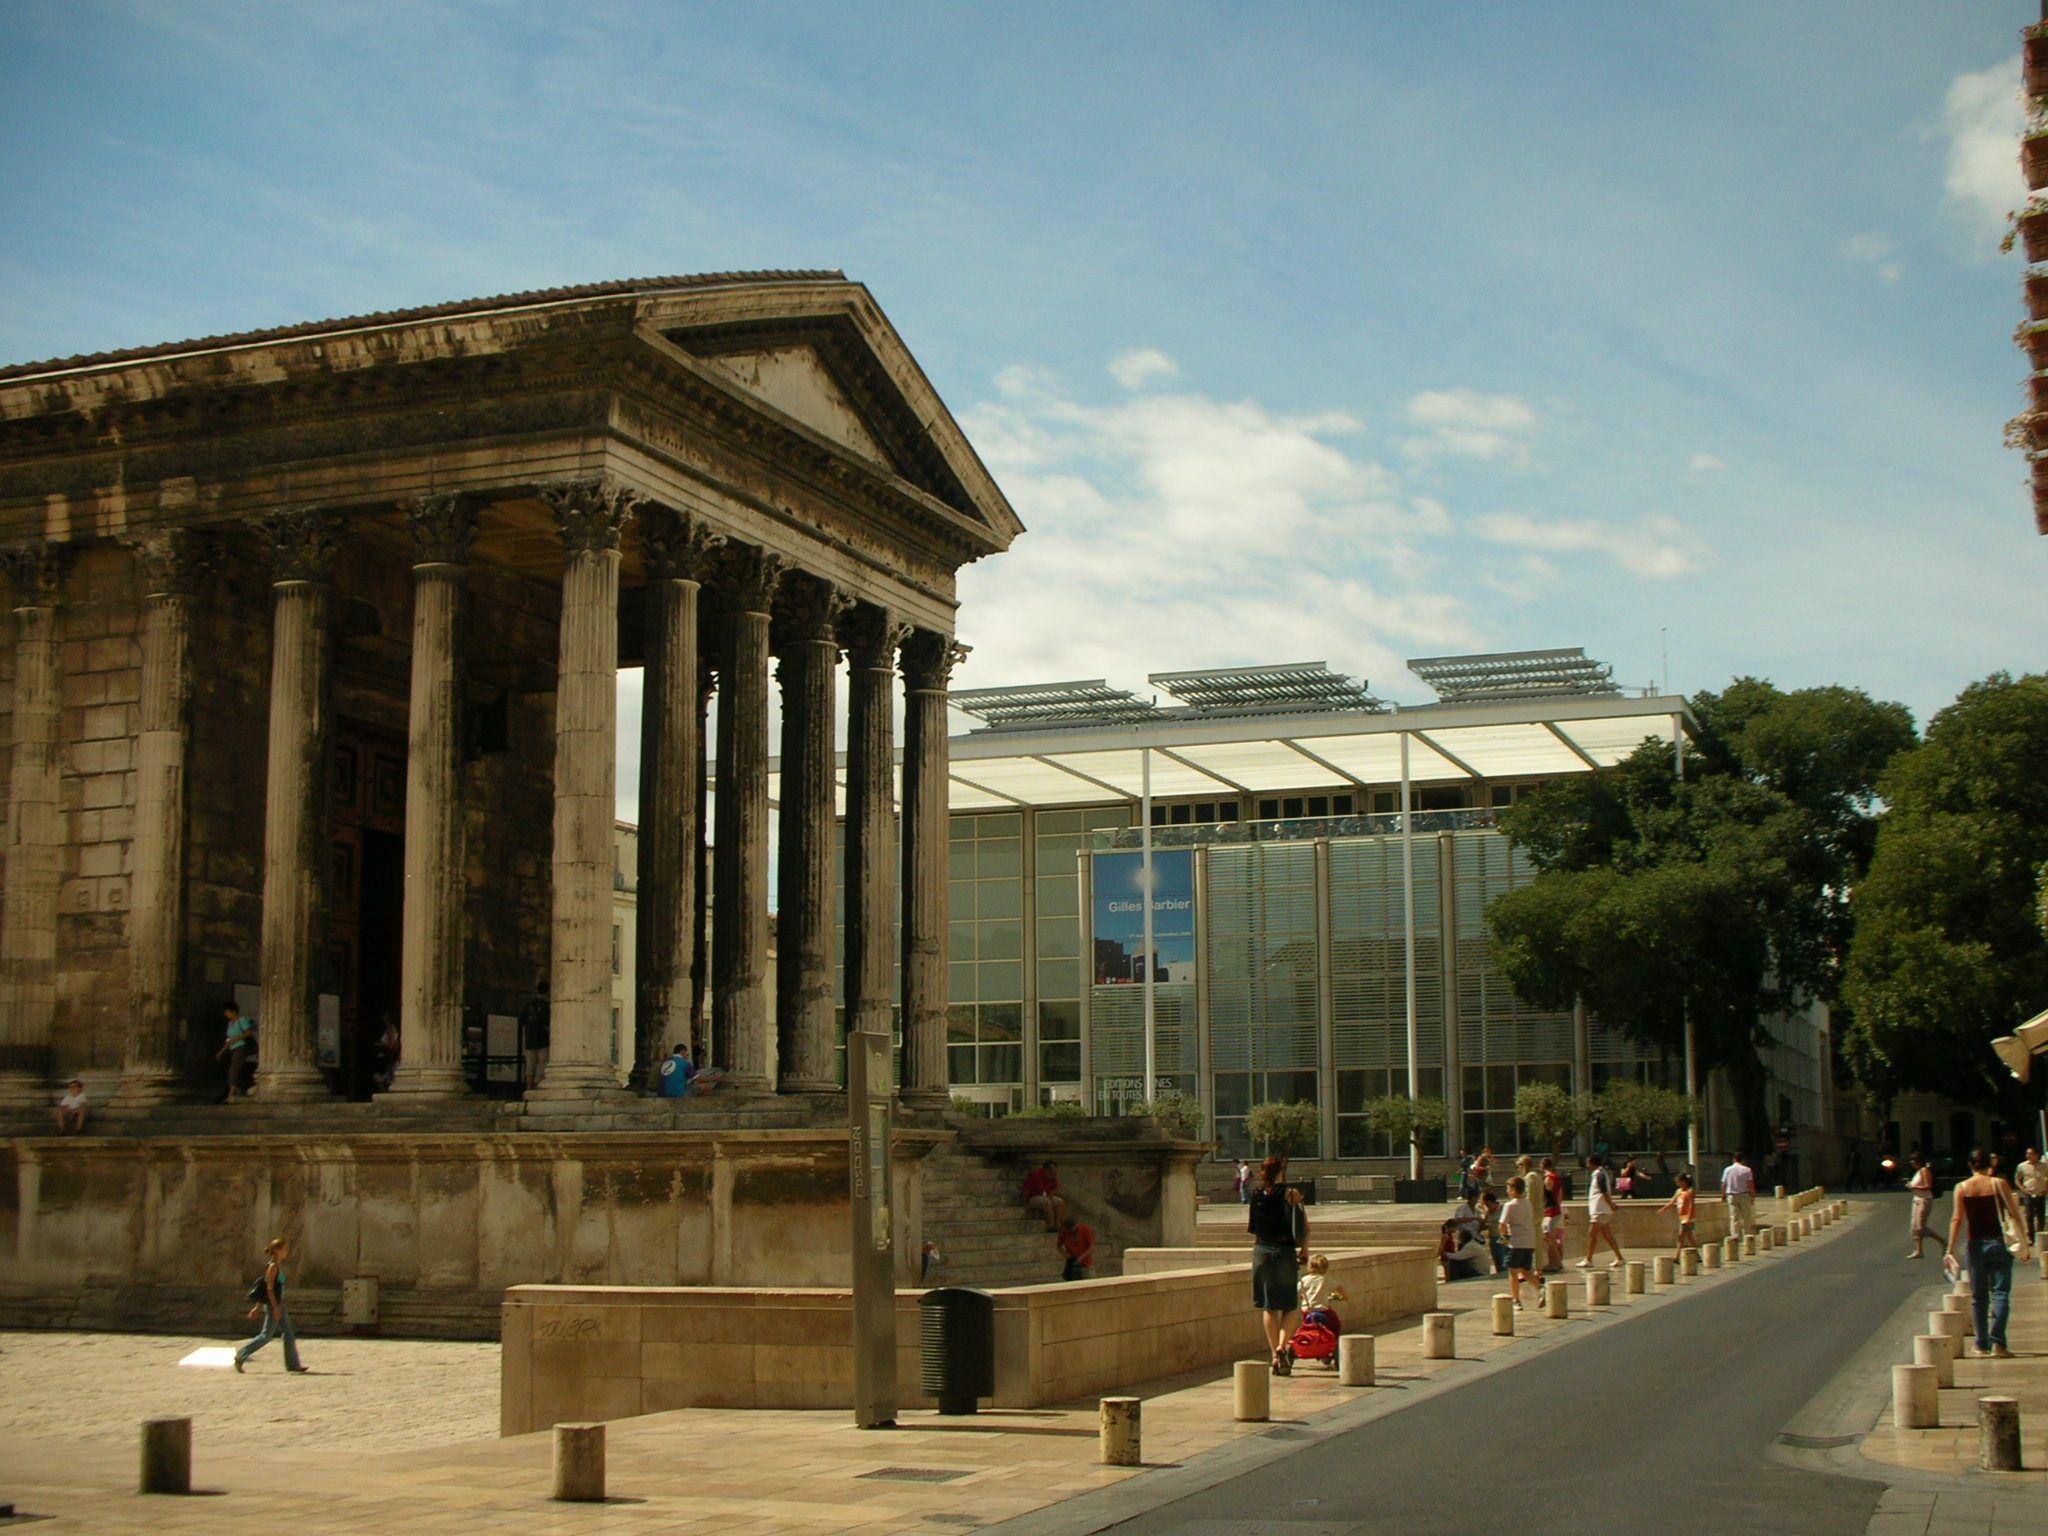 Carre D Art Musee D Art Contemporain Nimes France Top Tips